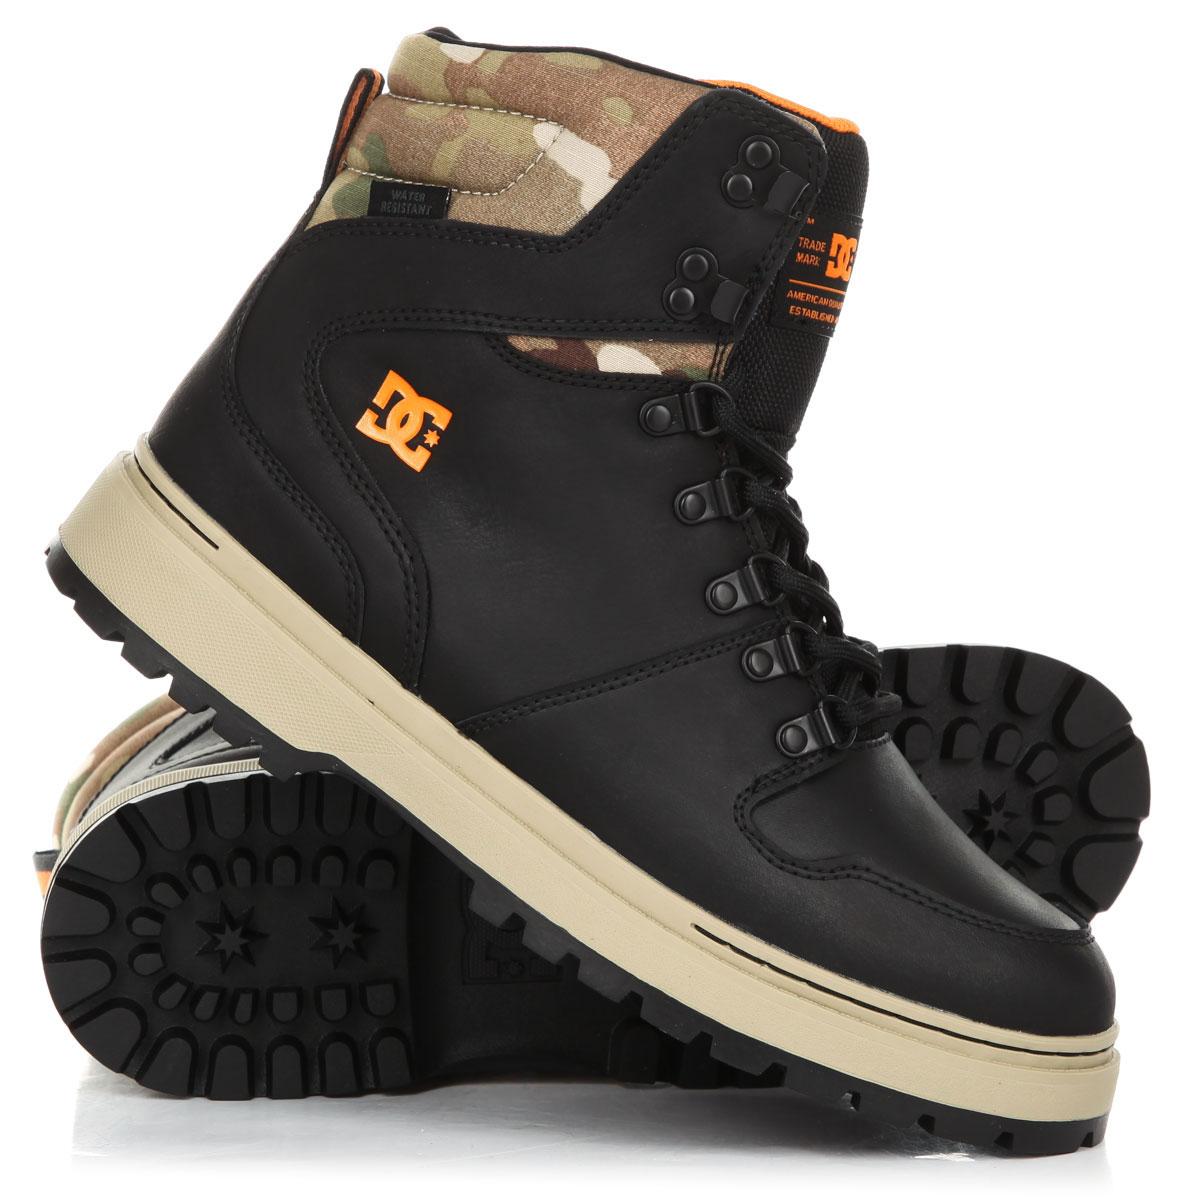 a2cf9410f Купить ботинки высокие DC Peary Tr Black/Multi (ADYB700022-KMI) в  интернет-магазине Proskater.by